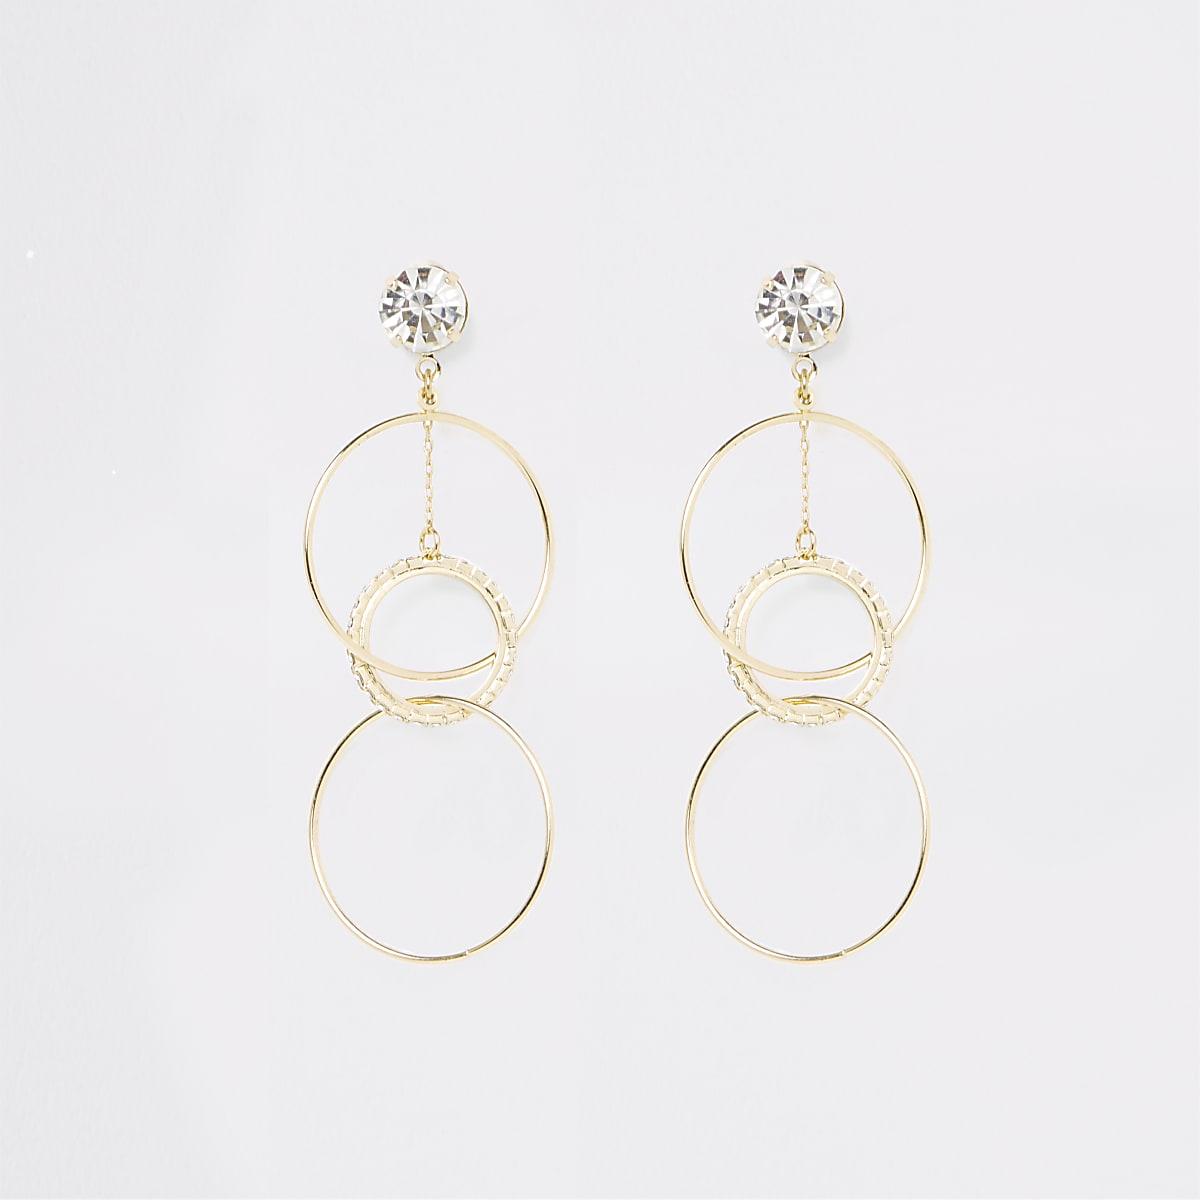 Gold color rhinestone interlink drop earrings